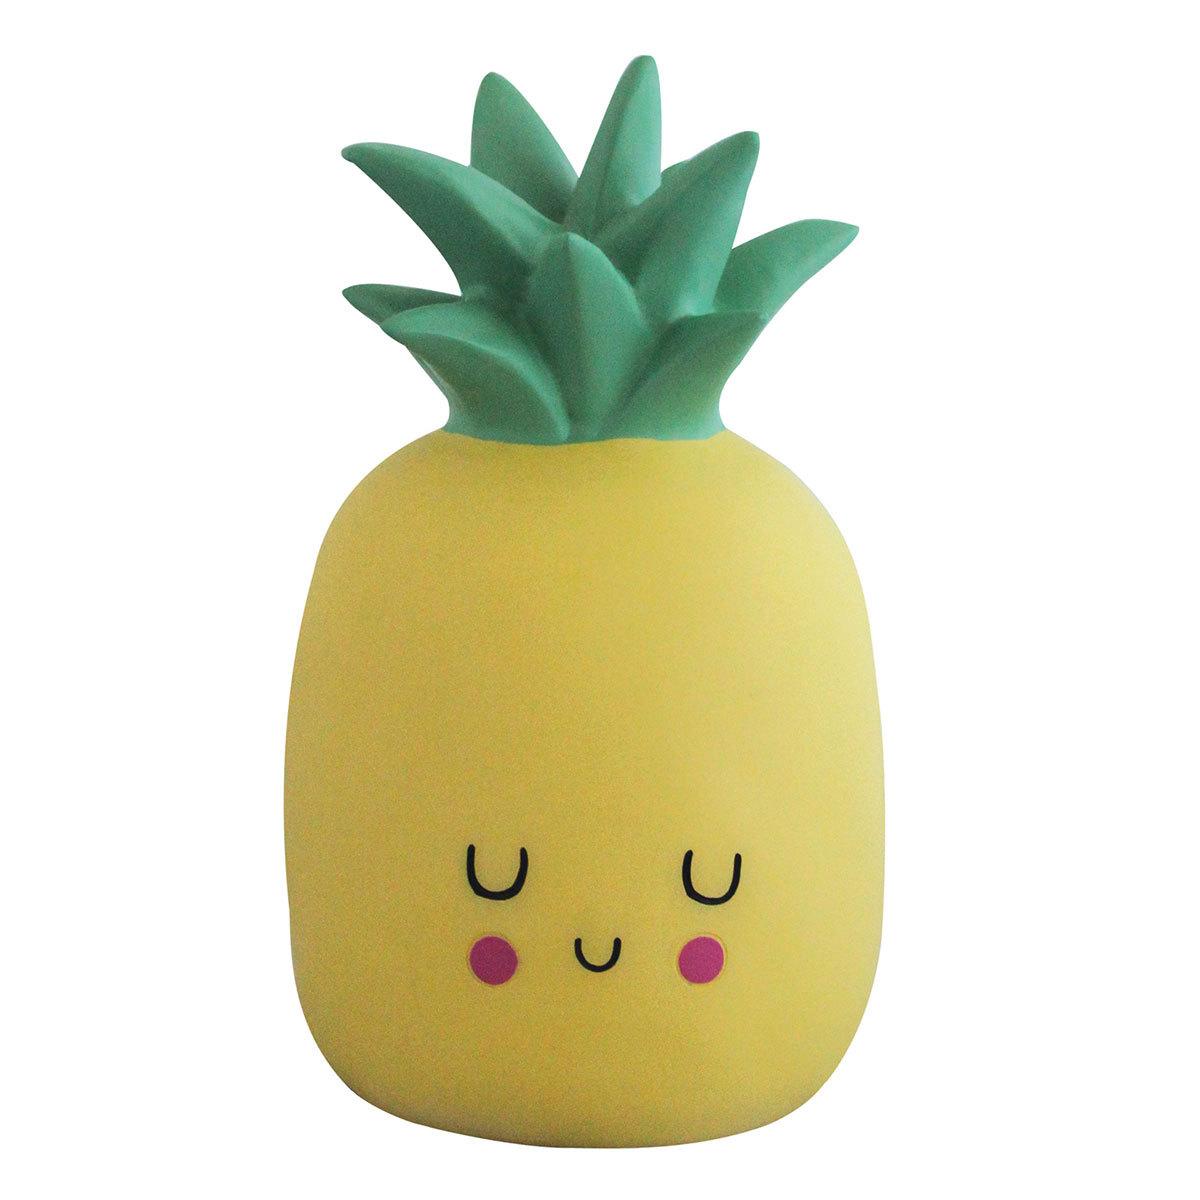 Veilleuse Veilleuse Ananas Veilleuse Ananas